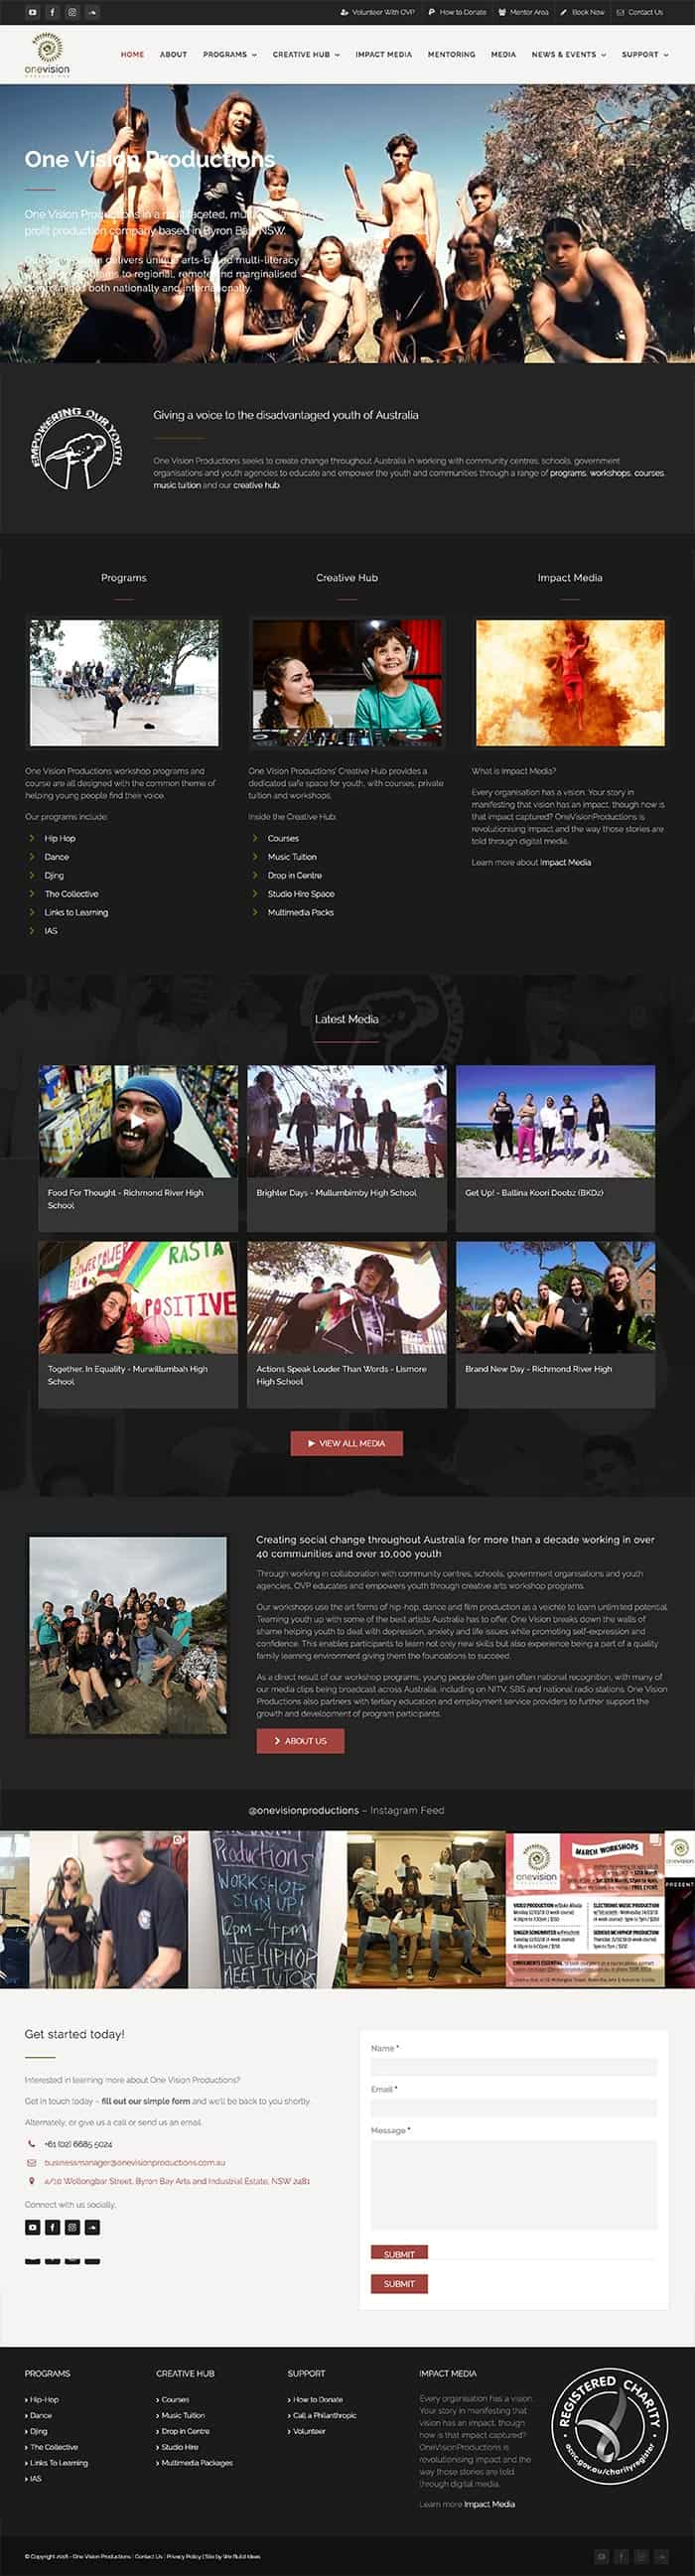 OVP Website Portfolio